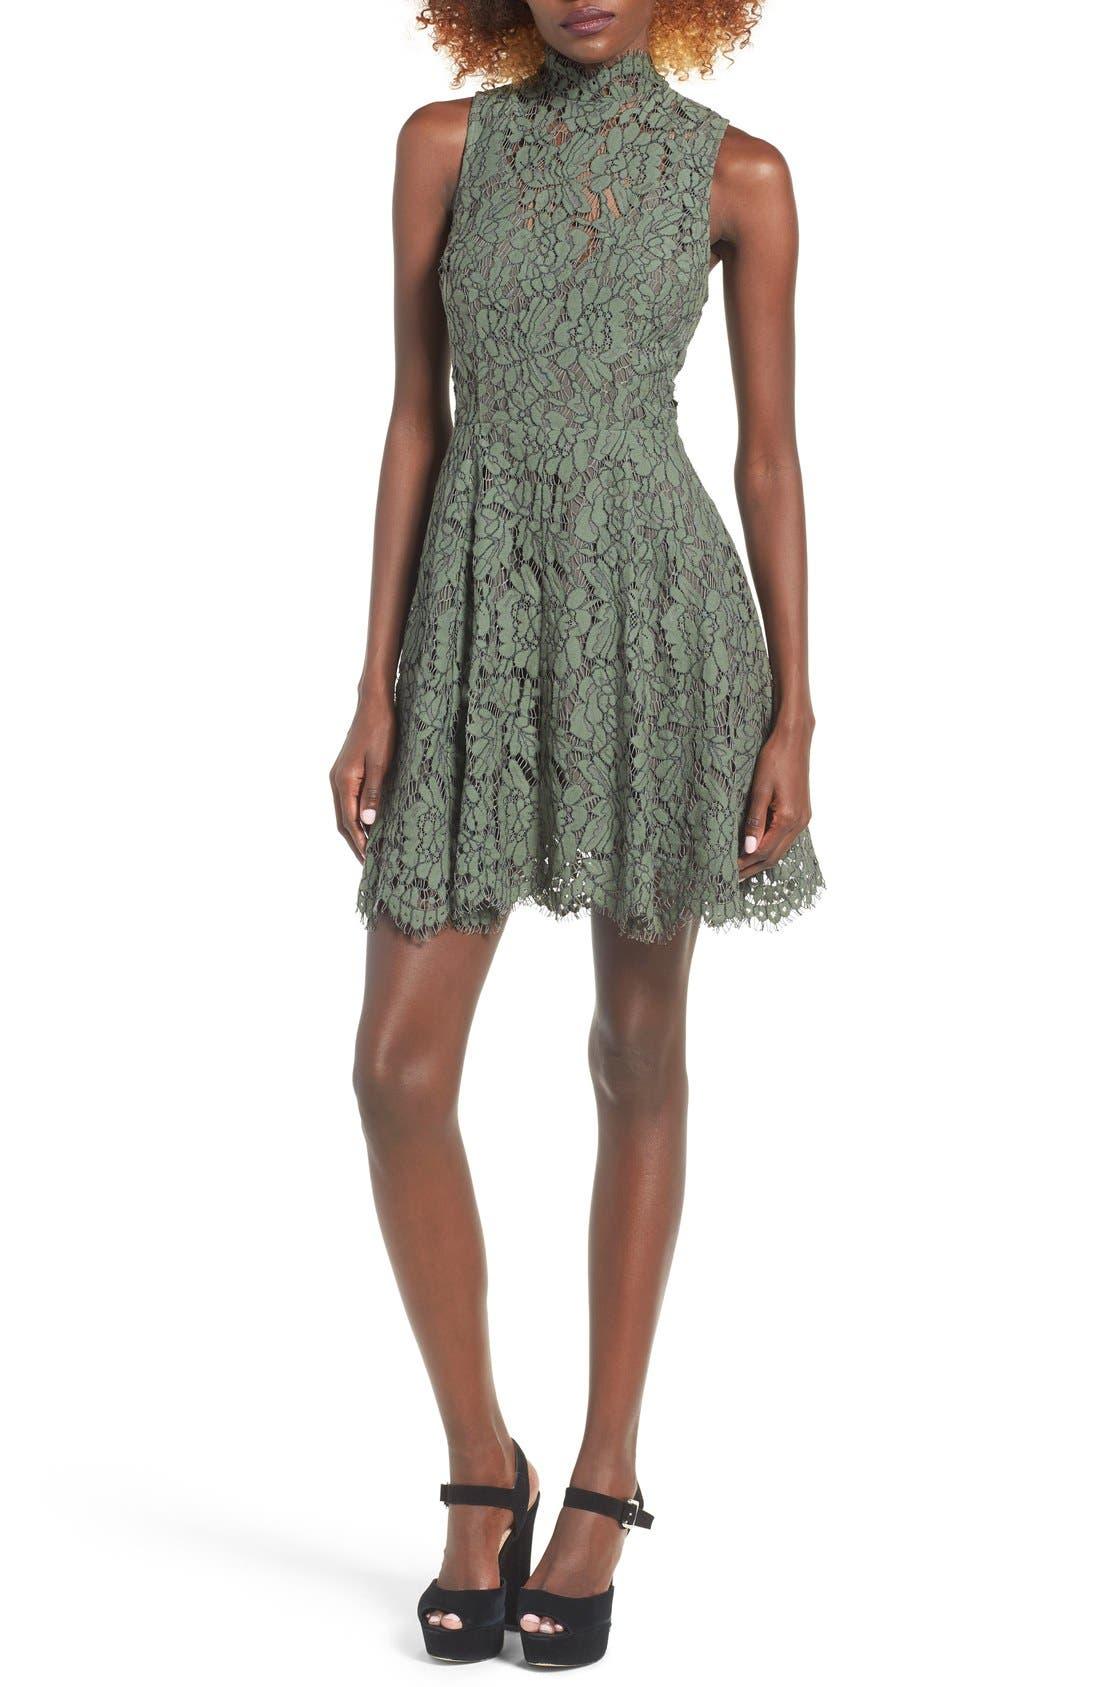 Alternate Image 1 Selected - Keepsake the Label Porcelain Lace Fit & Flare Dress